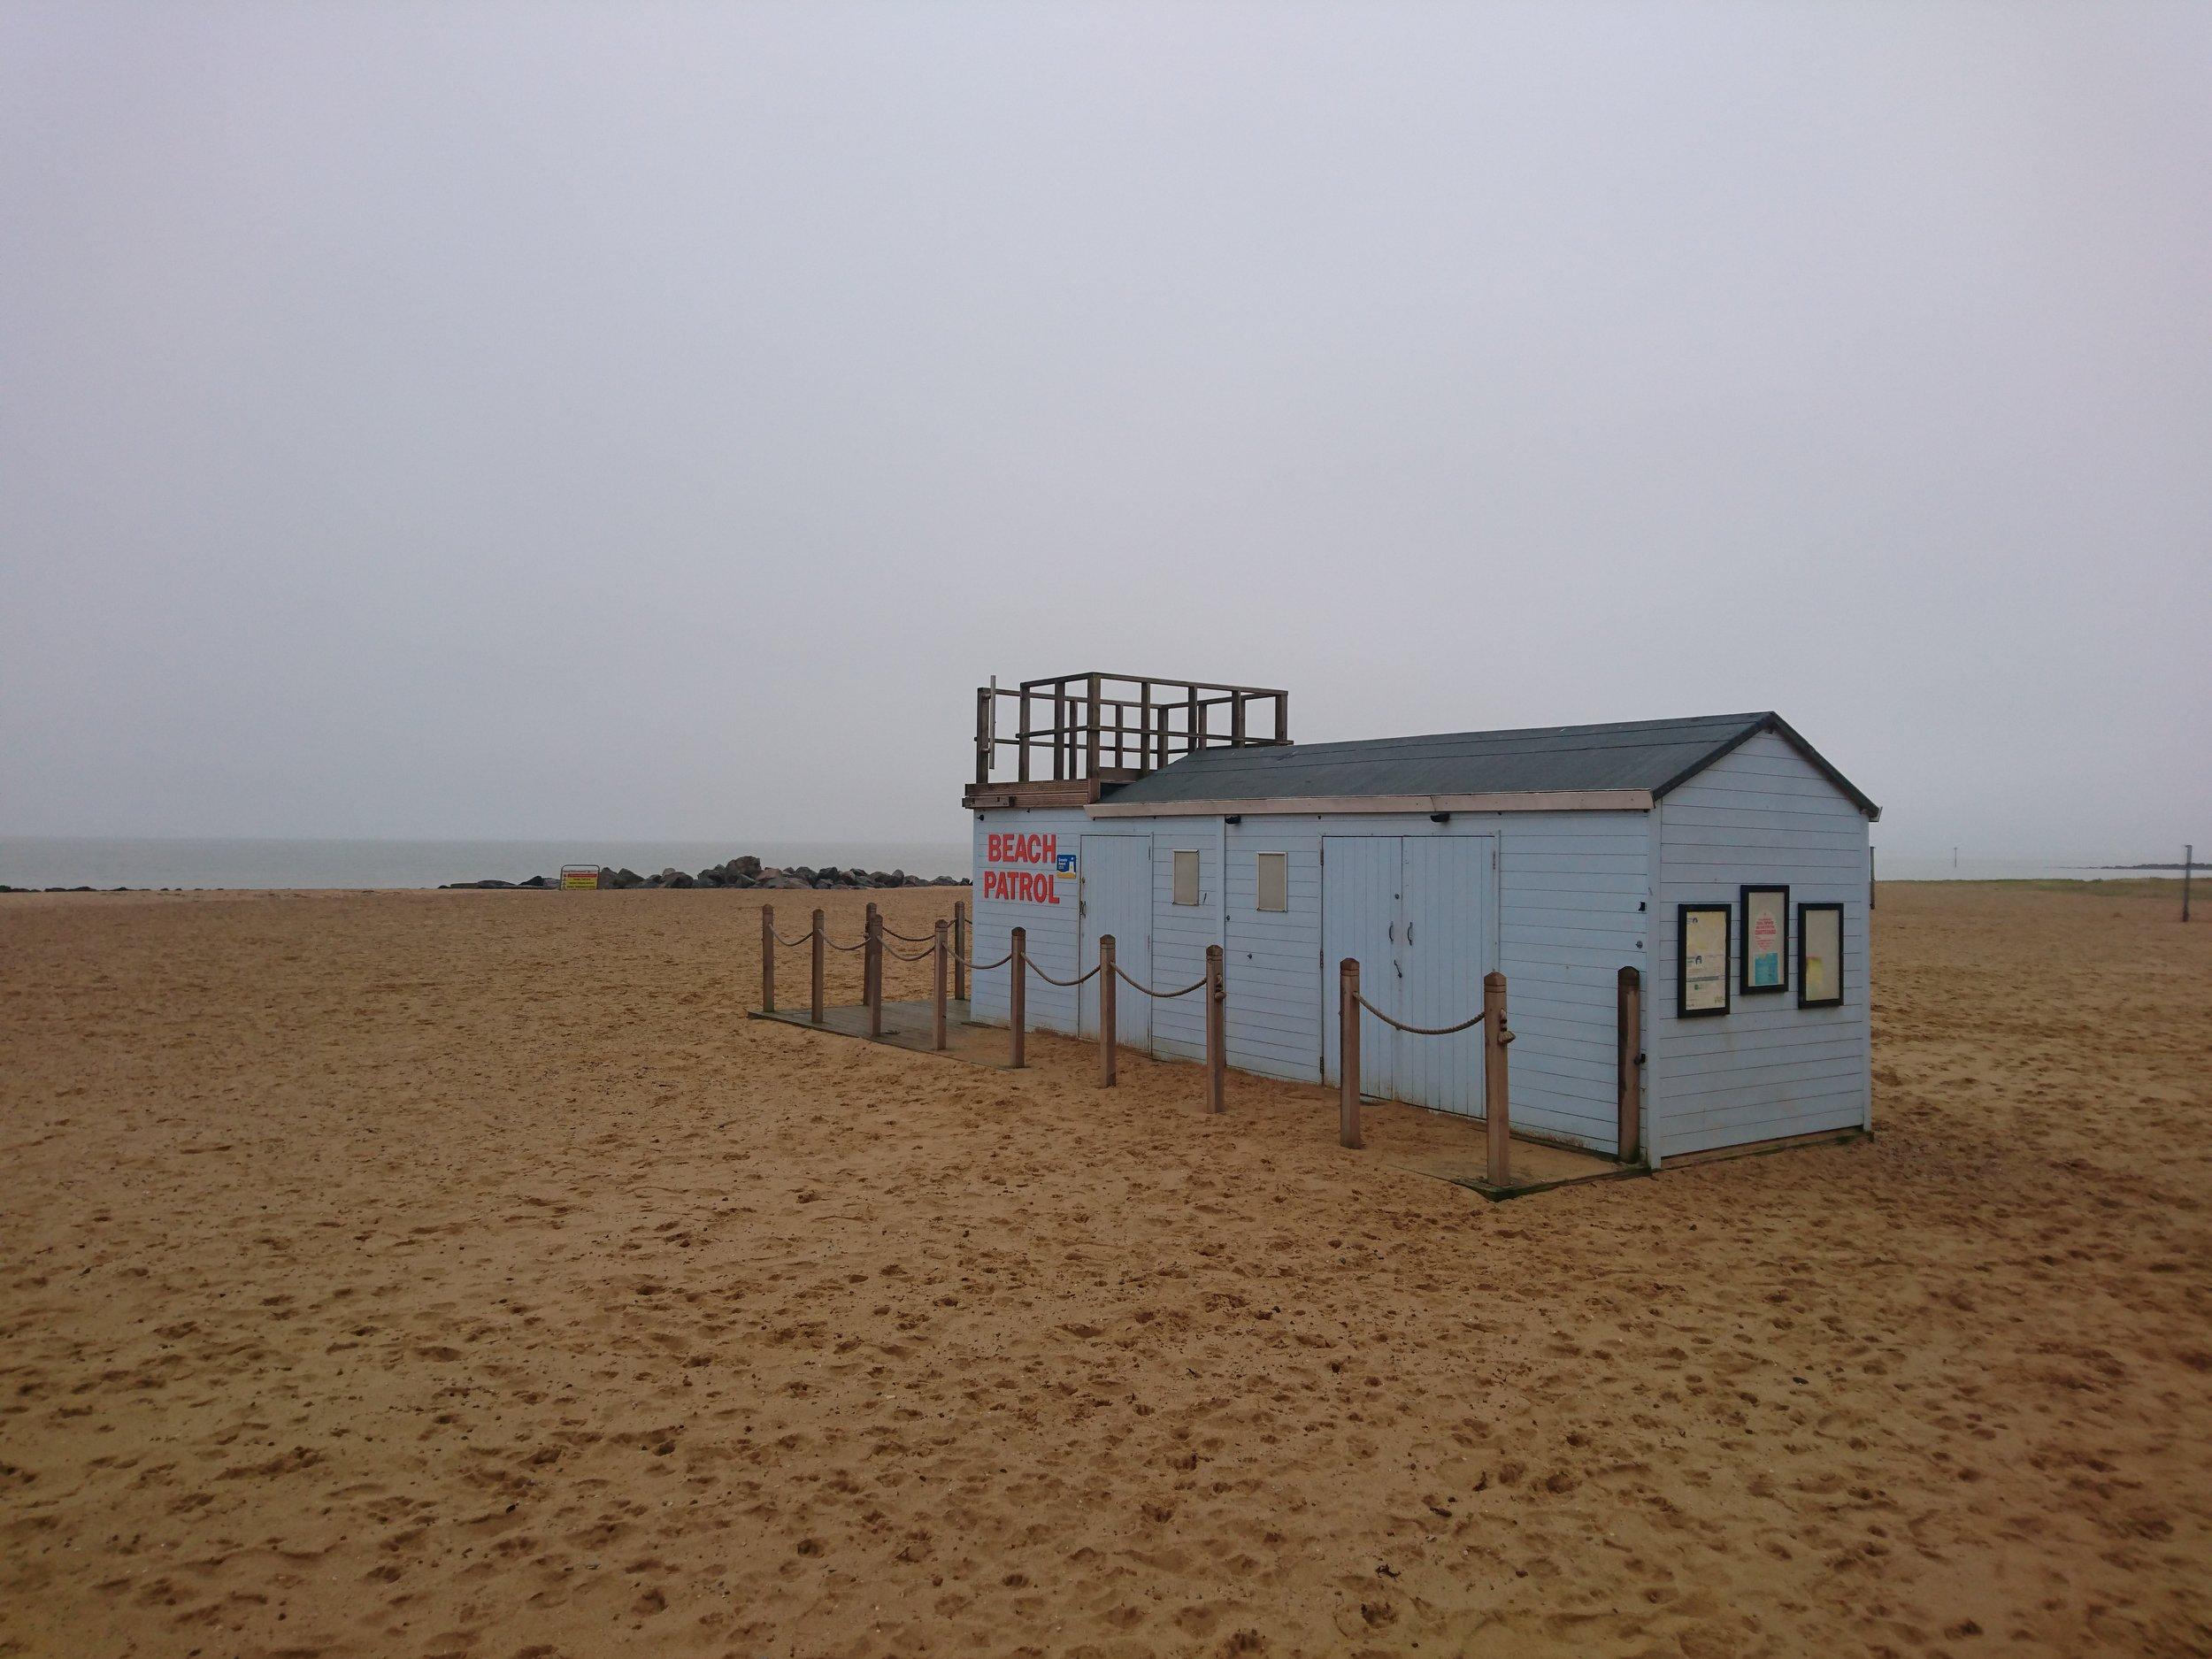 Beach Patrol Hut